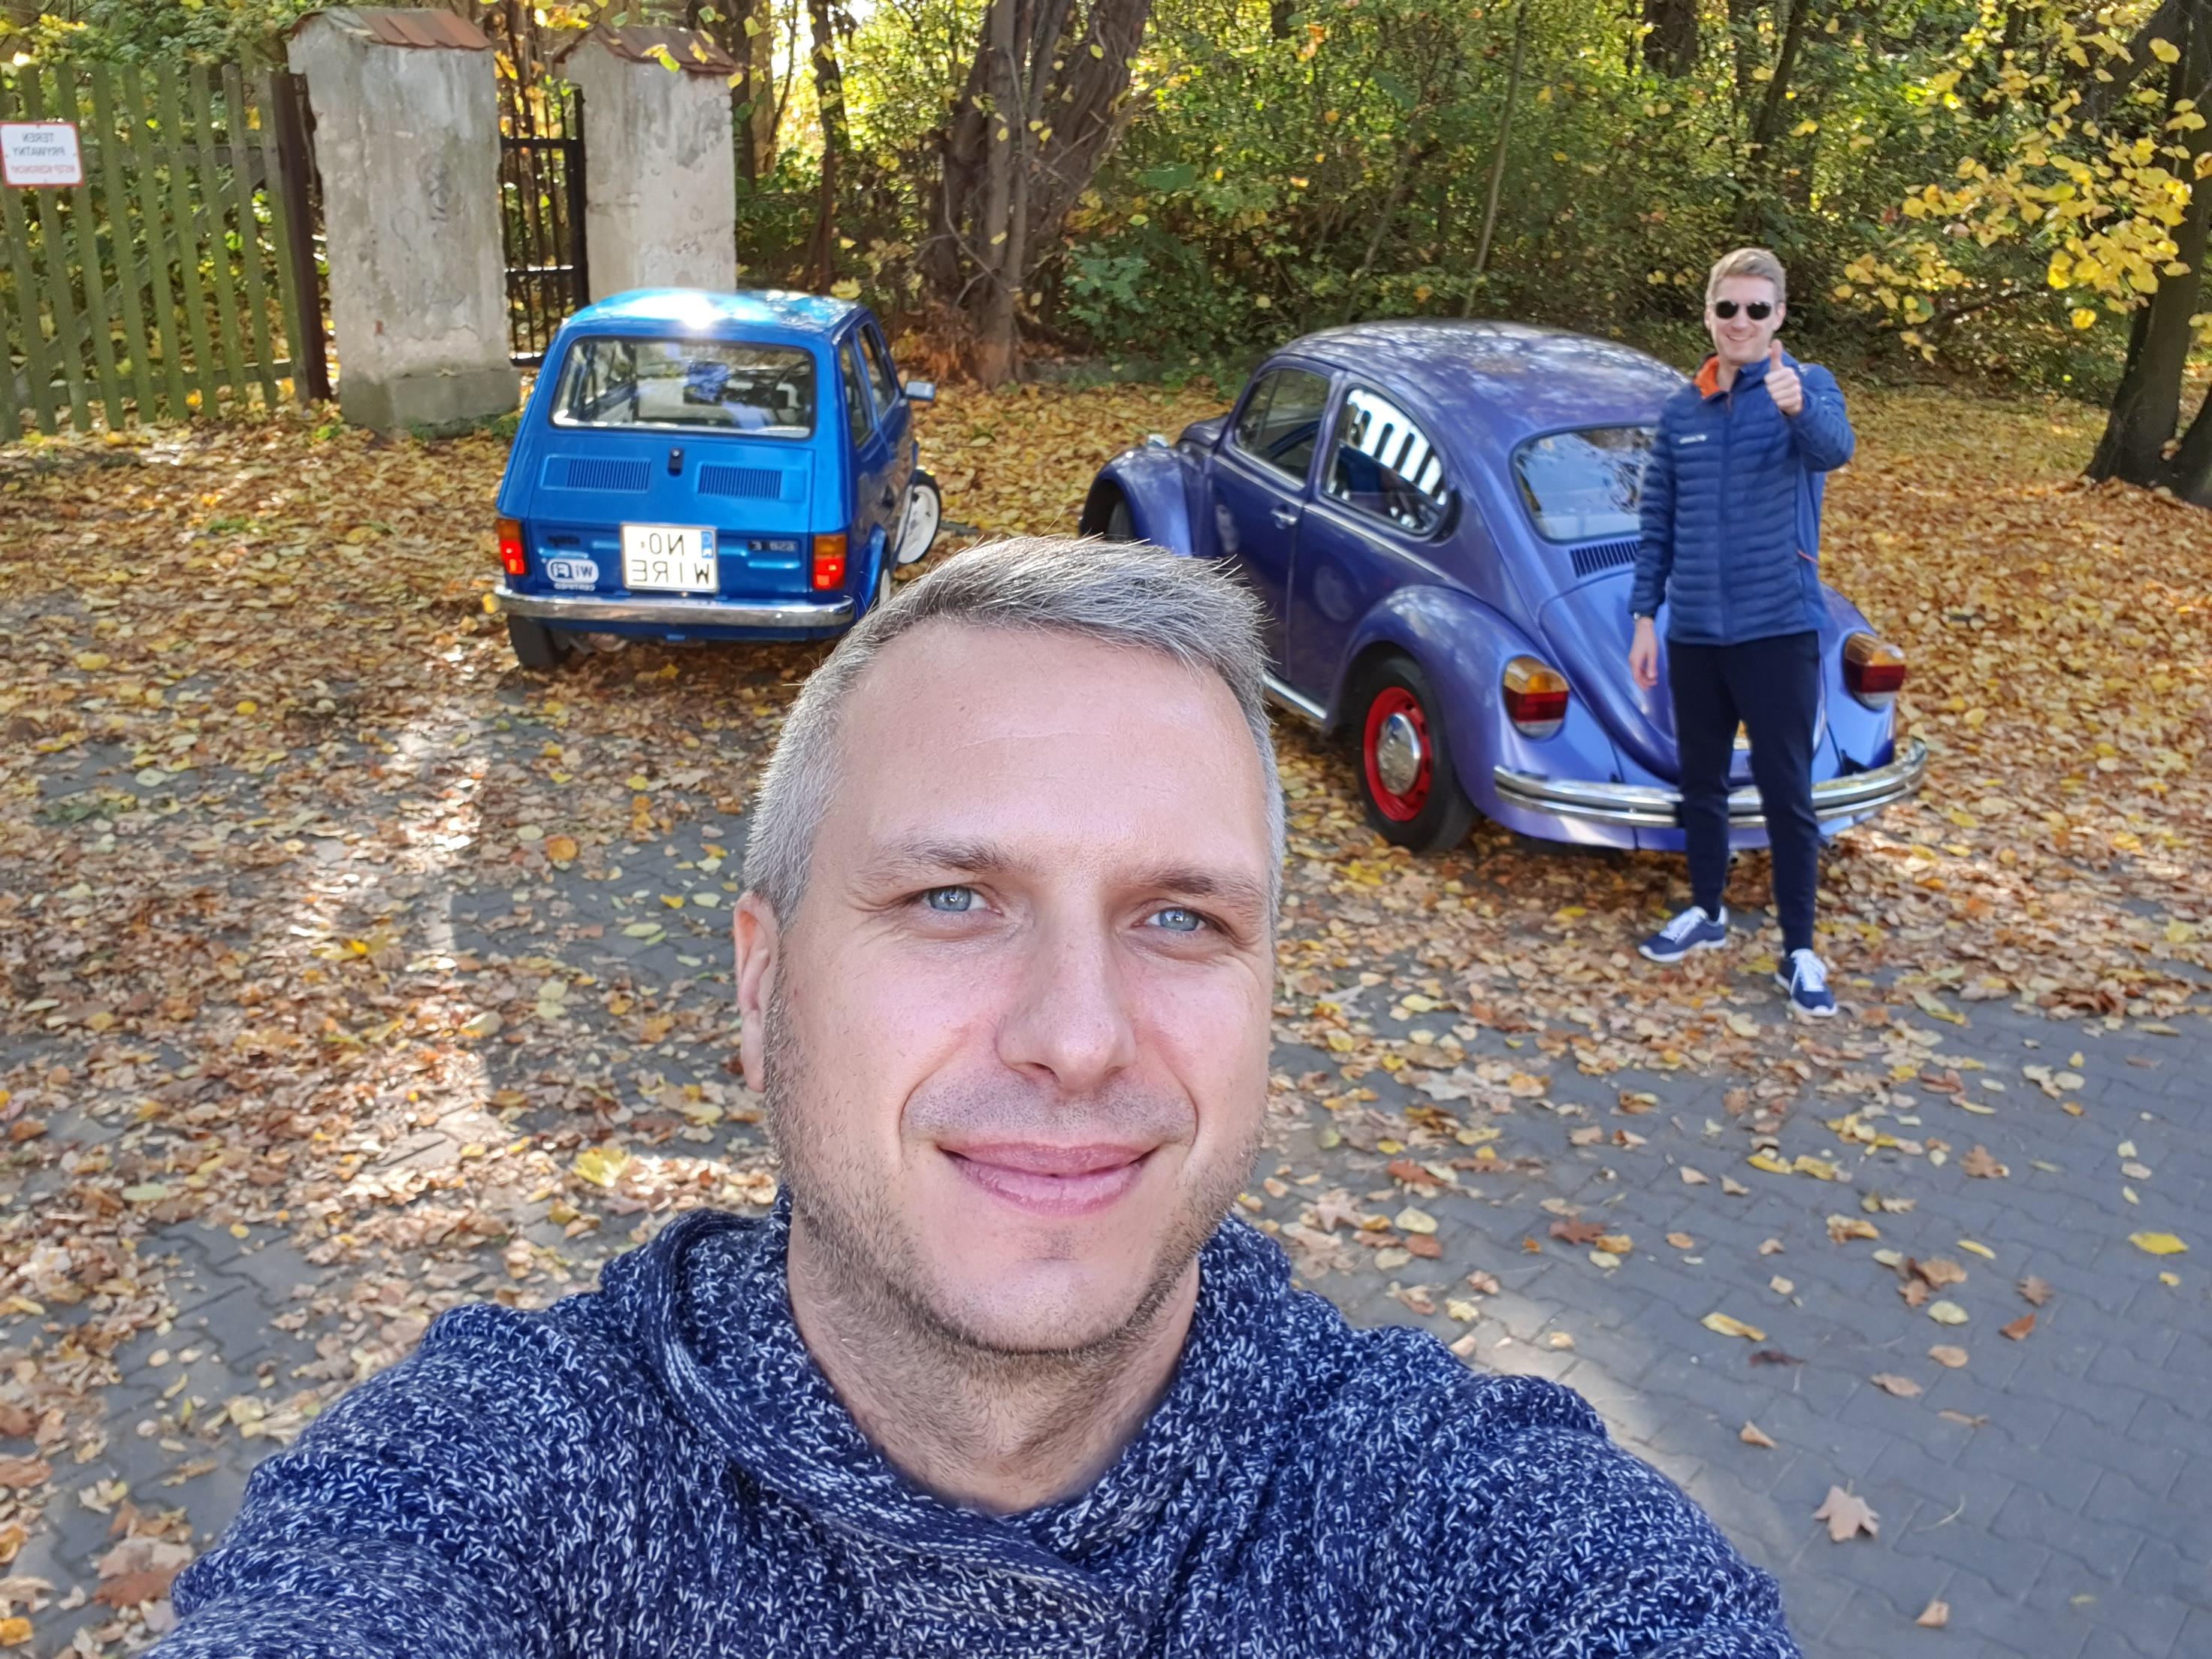 Jesien_2019_Fiat_126p_Garbus_2